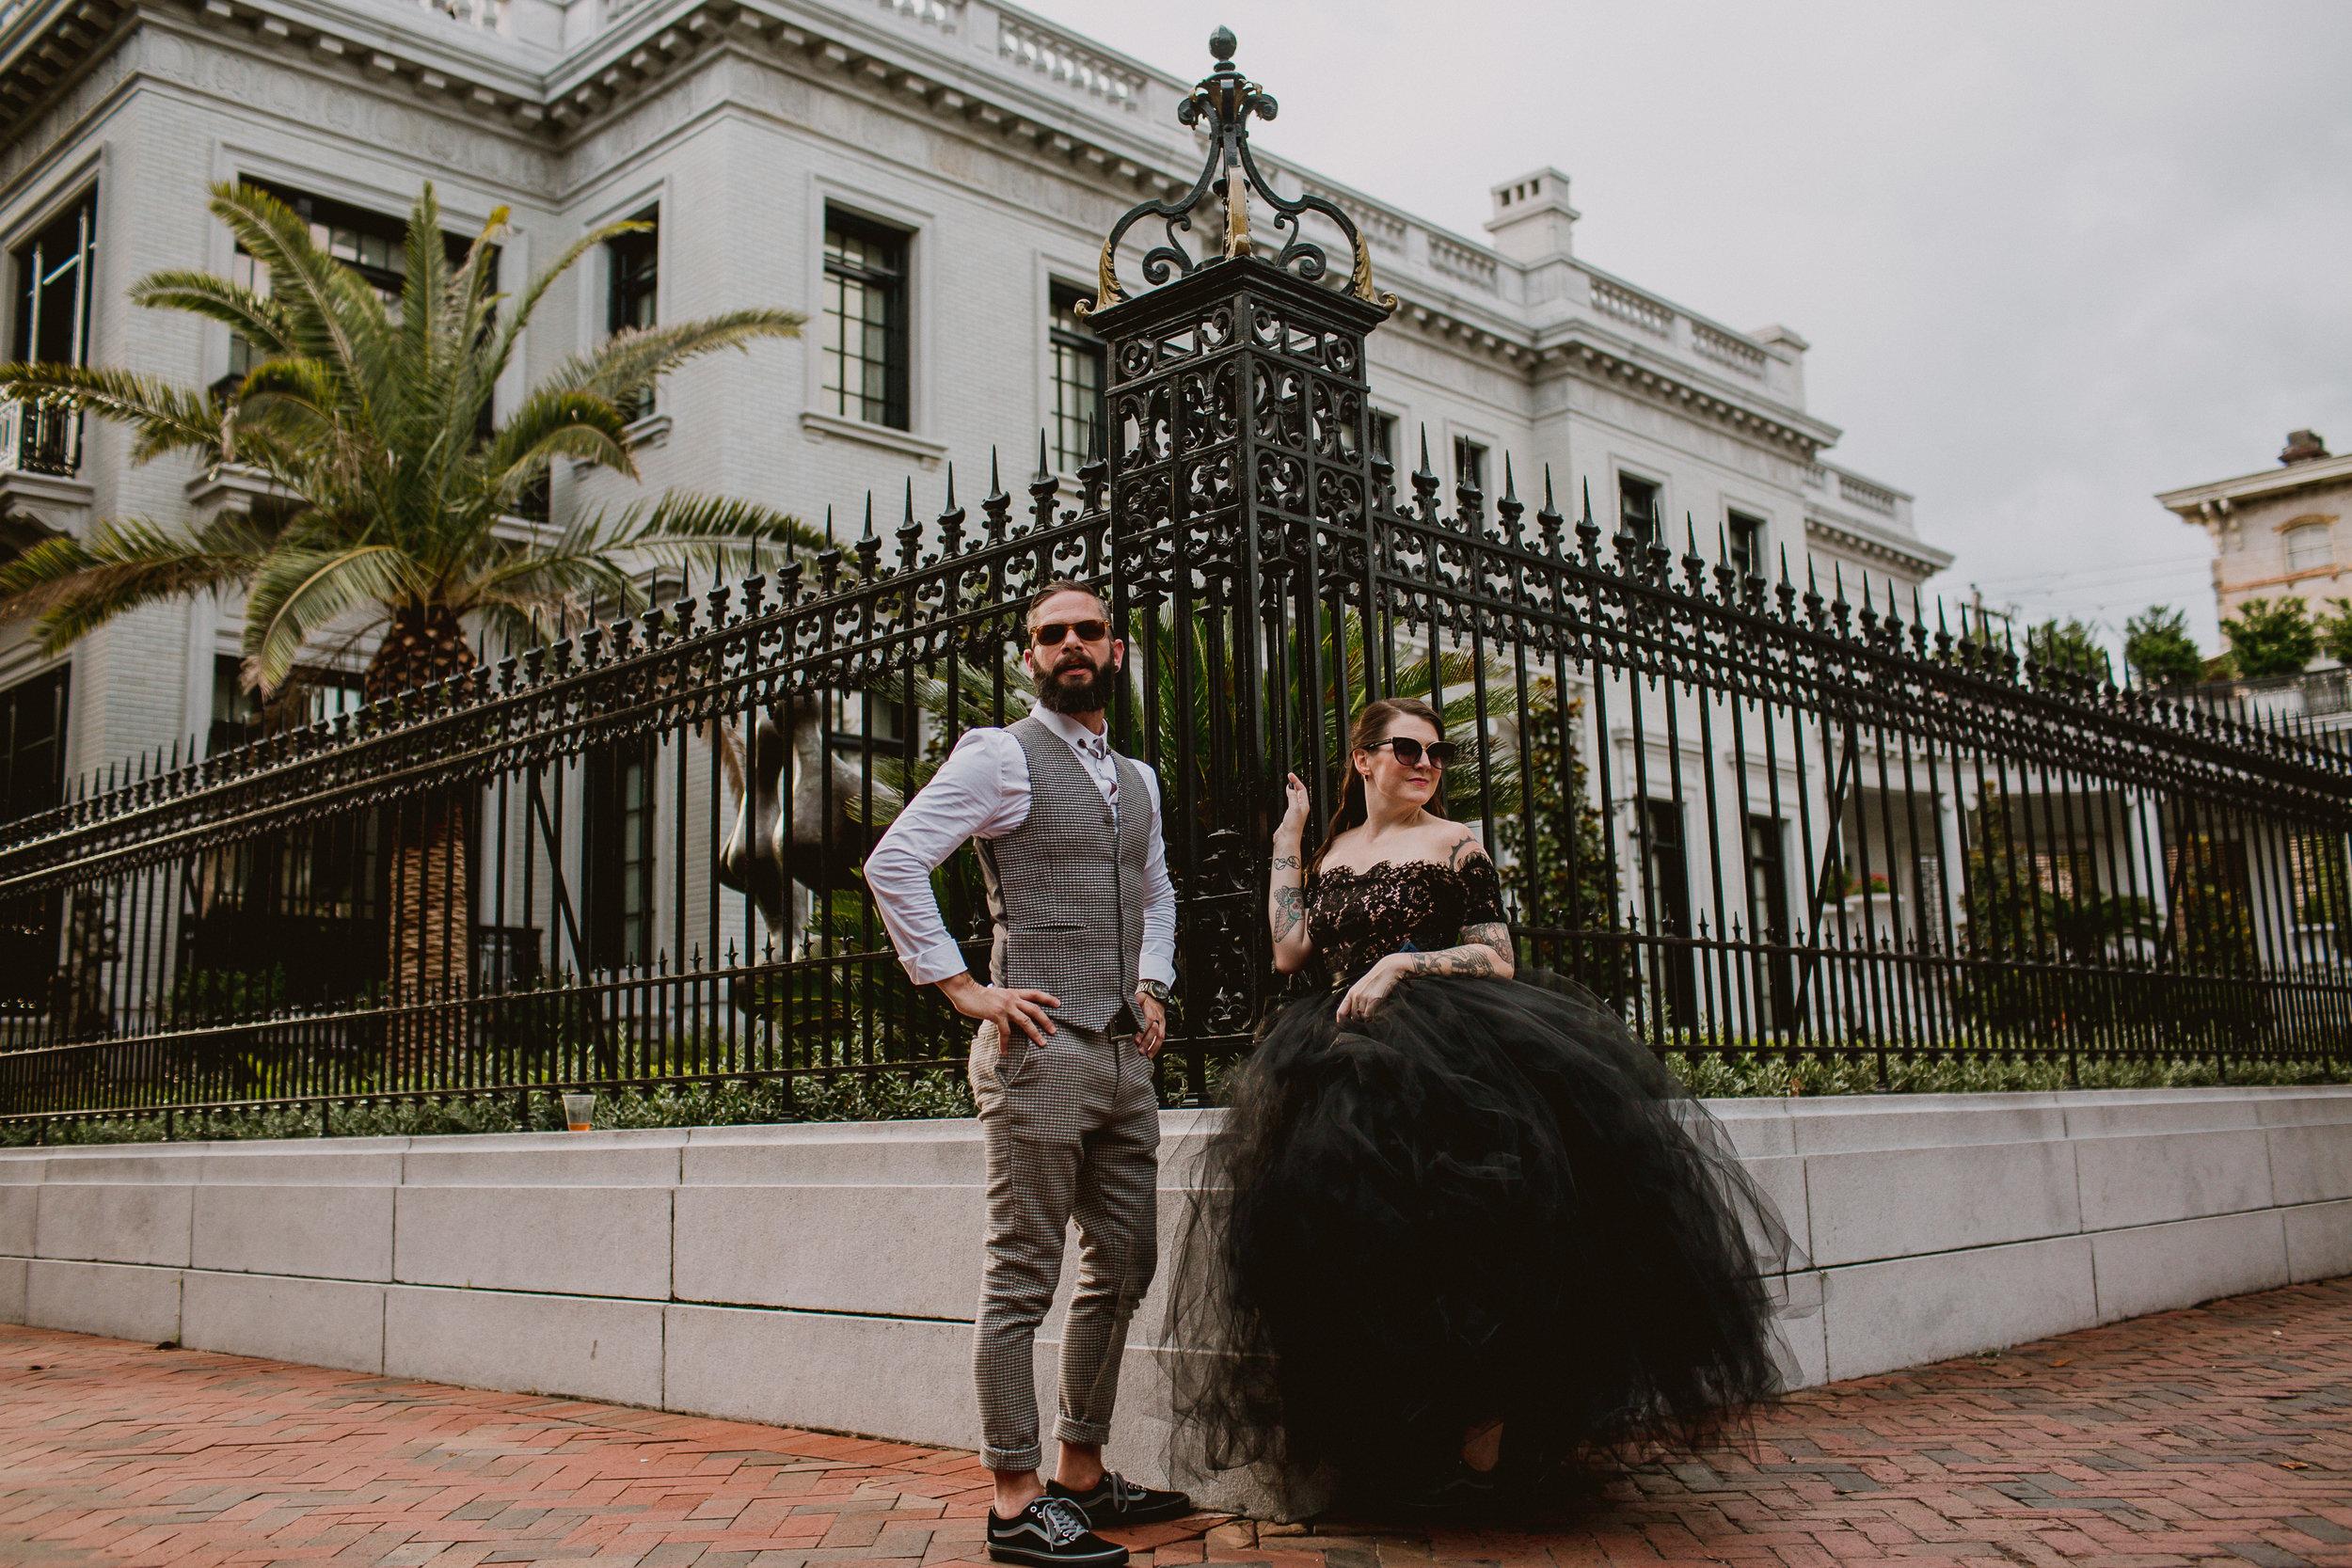 bohemian-hotel-savannah-elopement-kelley-raye-atlanta-wedding-photographer-114.jpg